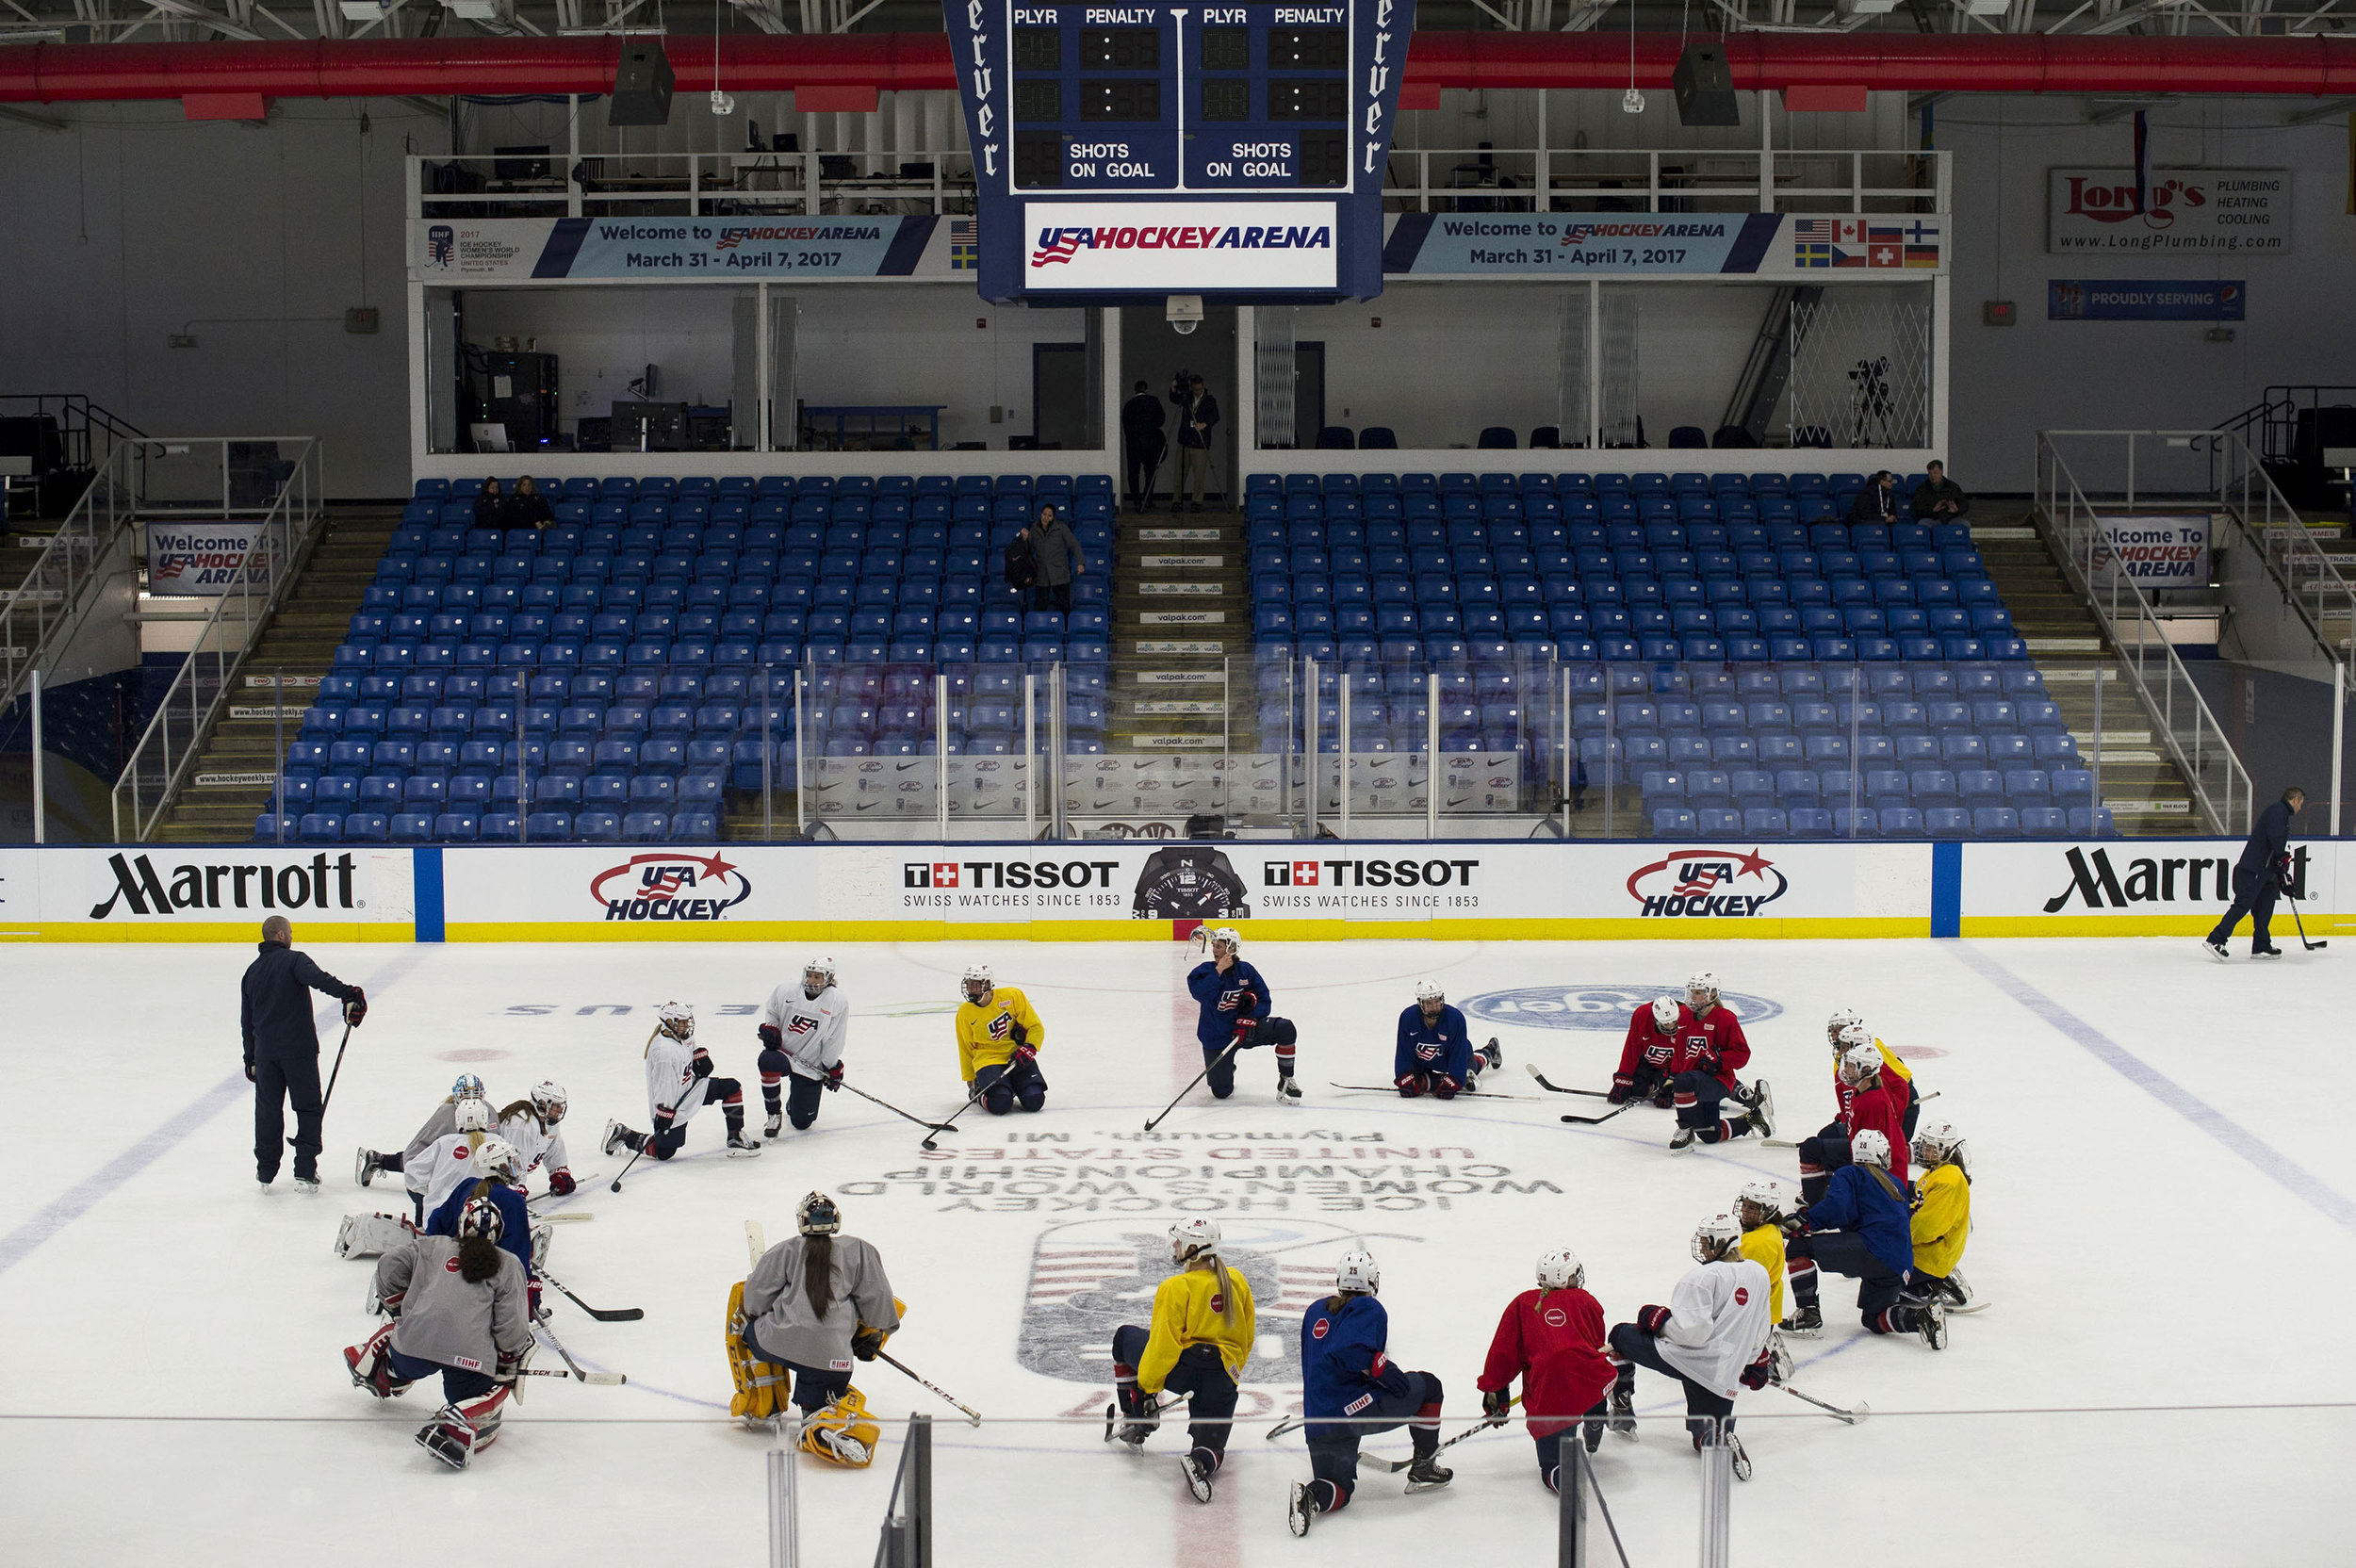 USA _Women's_Hockey_16.jpg